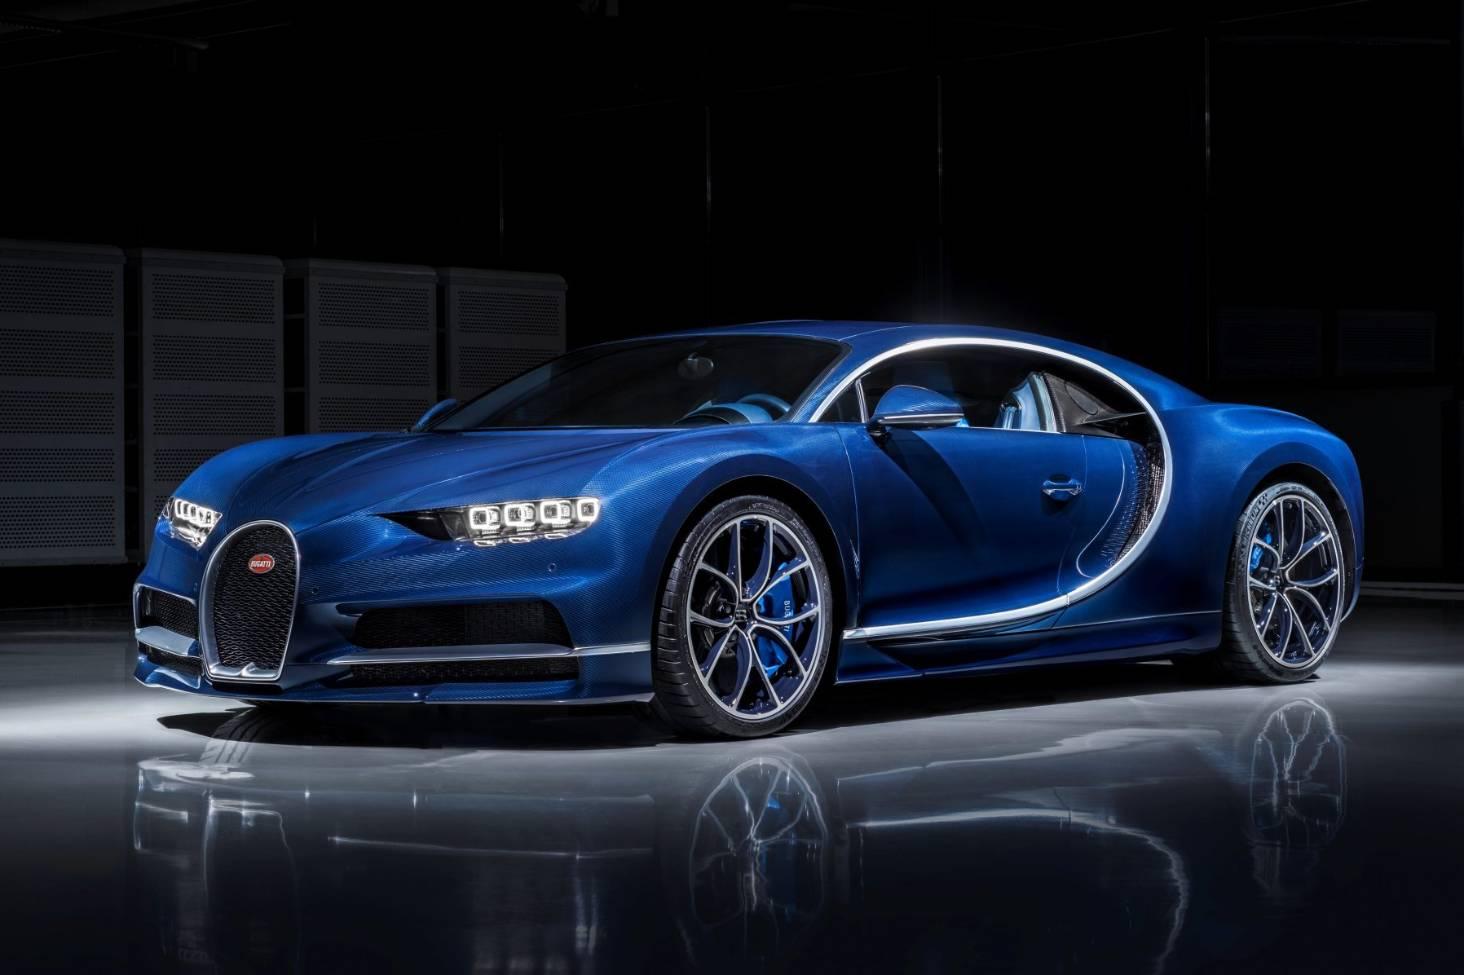 Driving The World S Fastest Most Luxurious Supercar The 4 Million Bugatti Chiron Stuff Co Nz